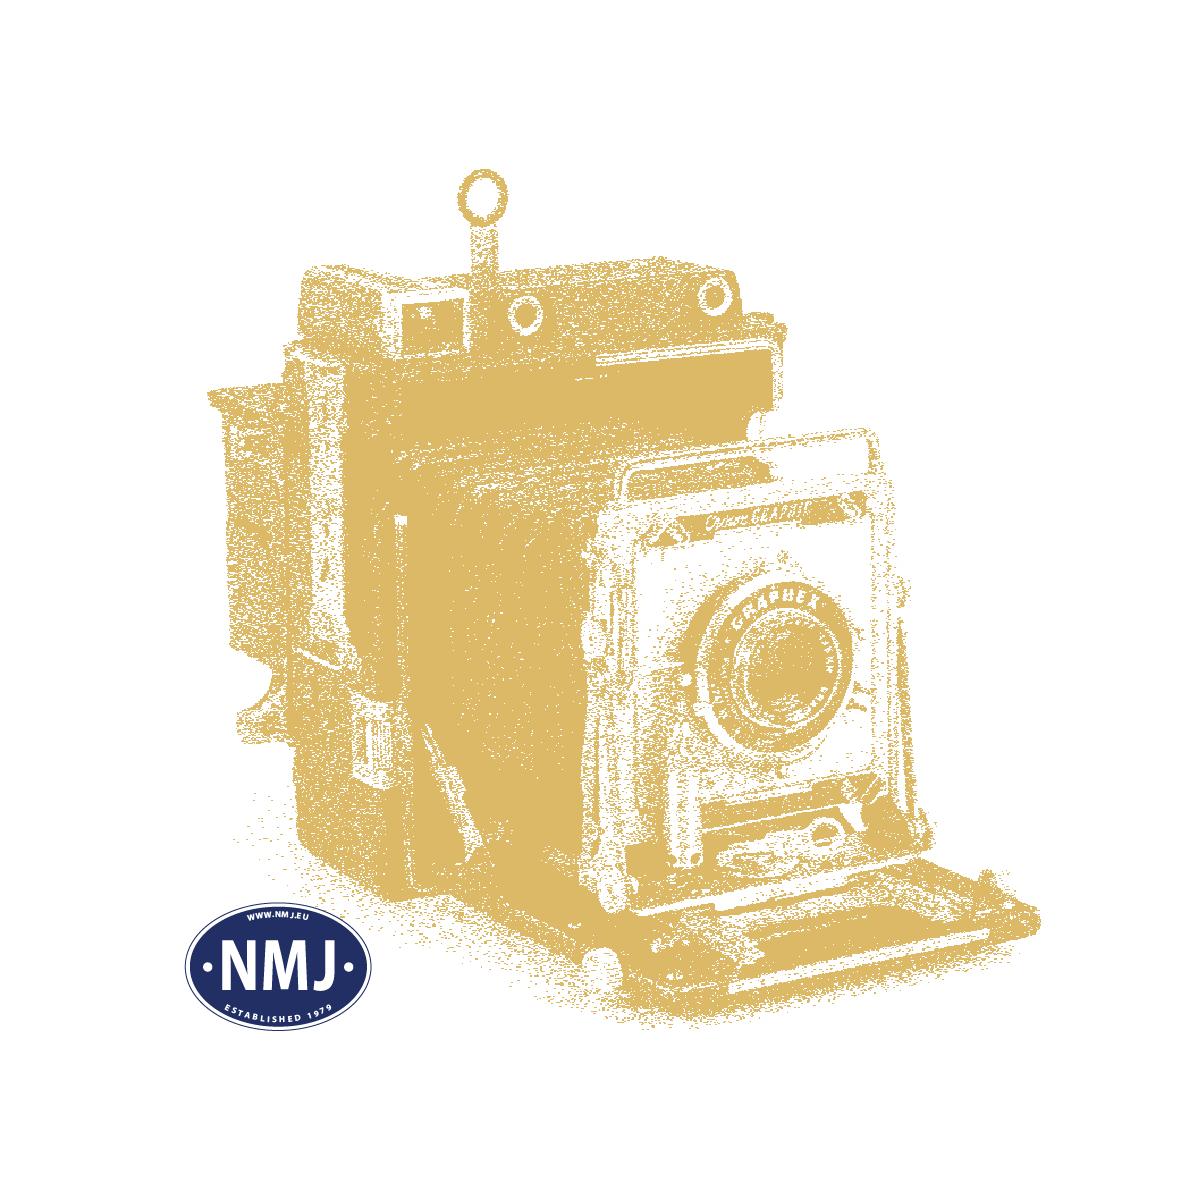 NOC14393 - Gløggutsalg, Laser-Cut